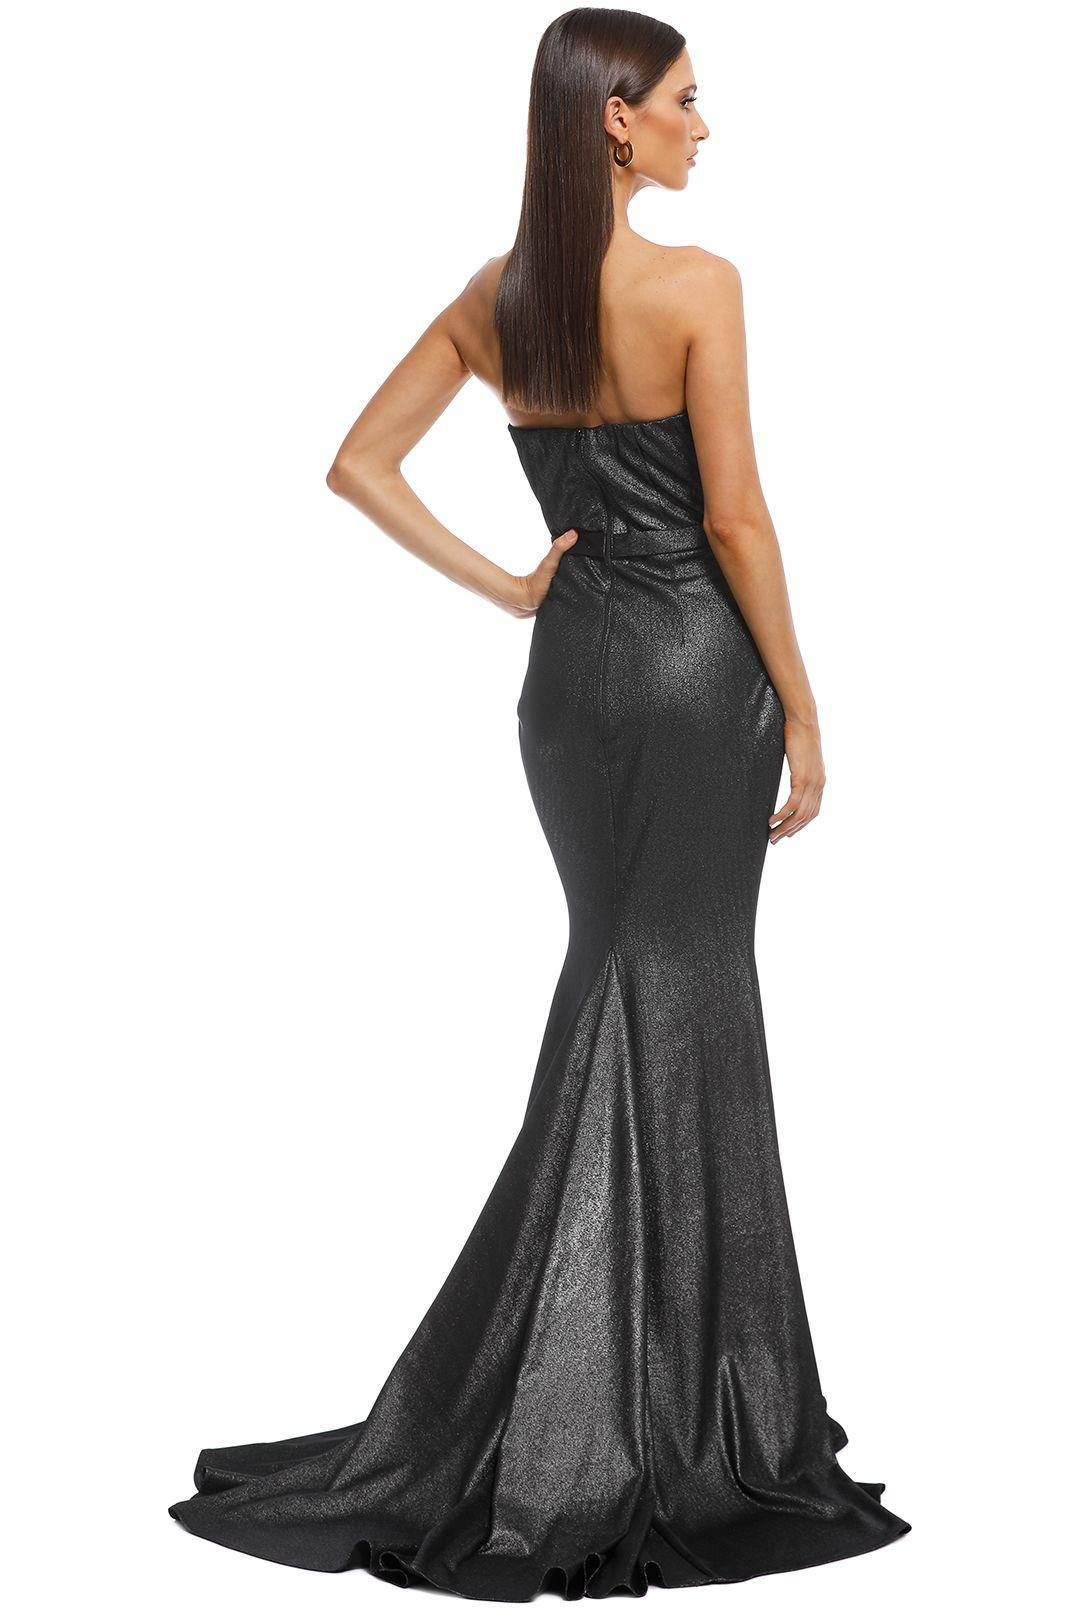 Jadore - Lucille Gown - Platinum - Back